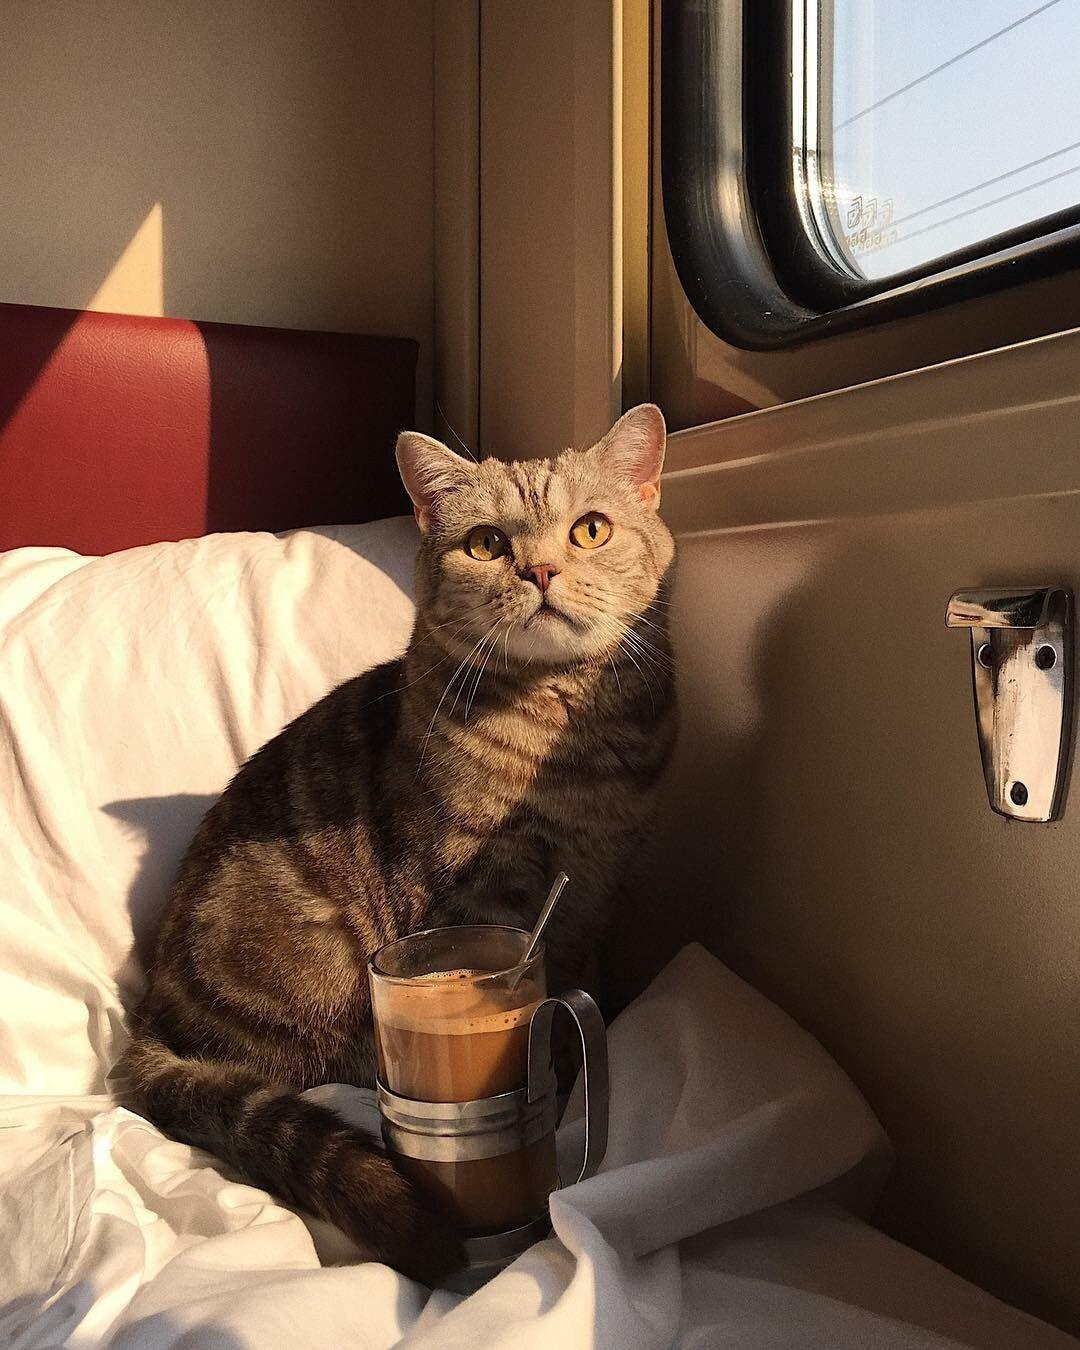 кисулькен / кот / поезд  / вагон / кофе